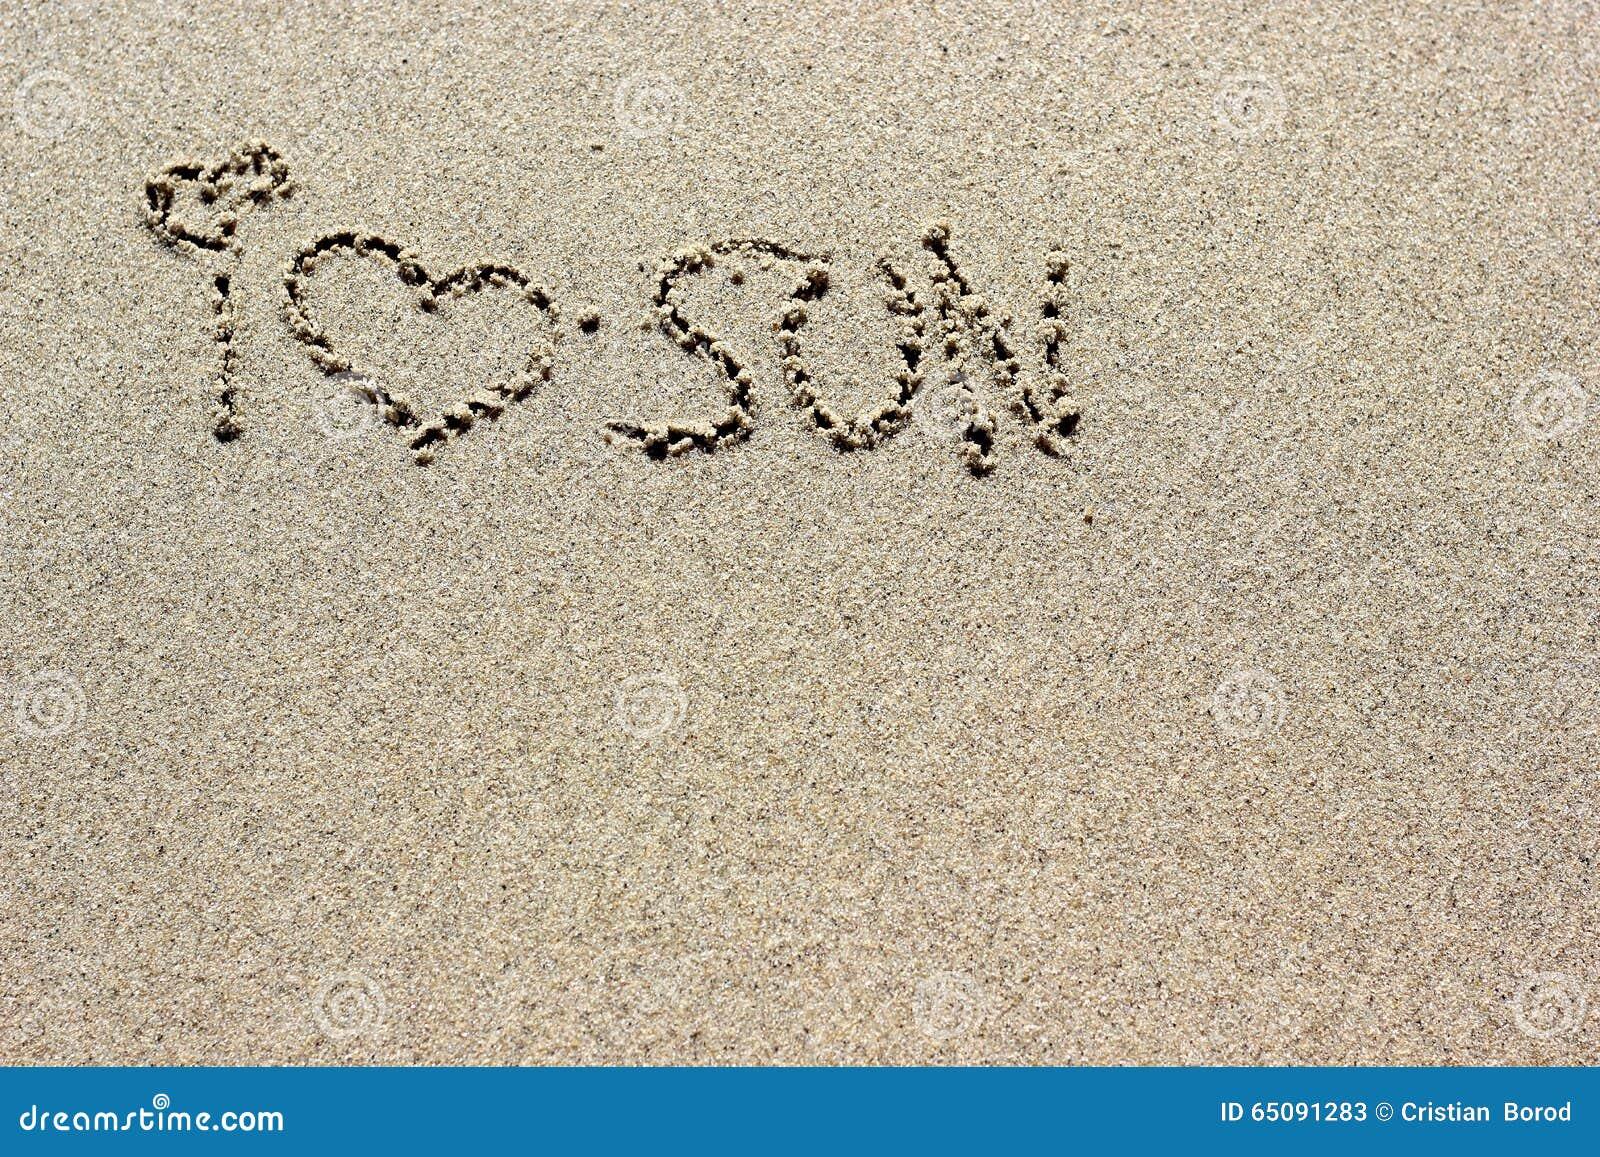 Eu Te Amo Escrito Na Areia Imagens De Stock Royalty Free: Eu Amo As Palavras Do Sol Escritas Na Areia Textura Do